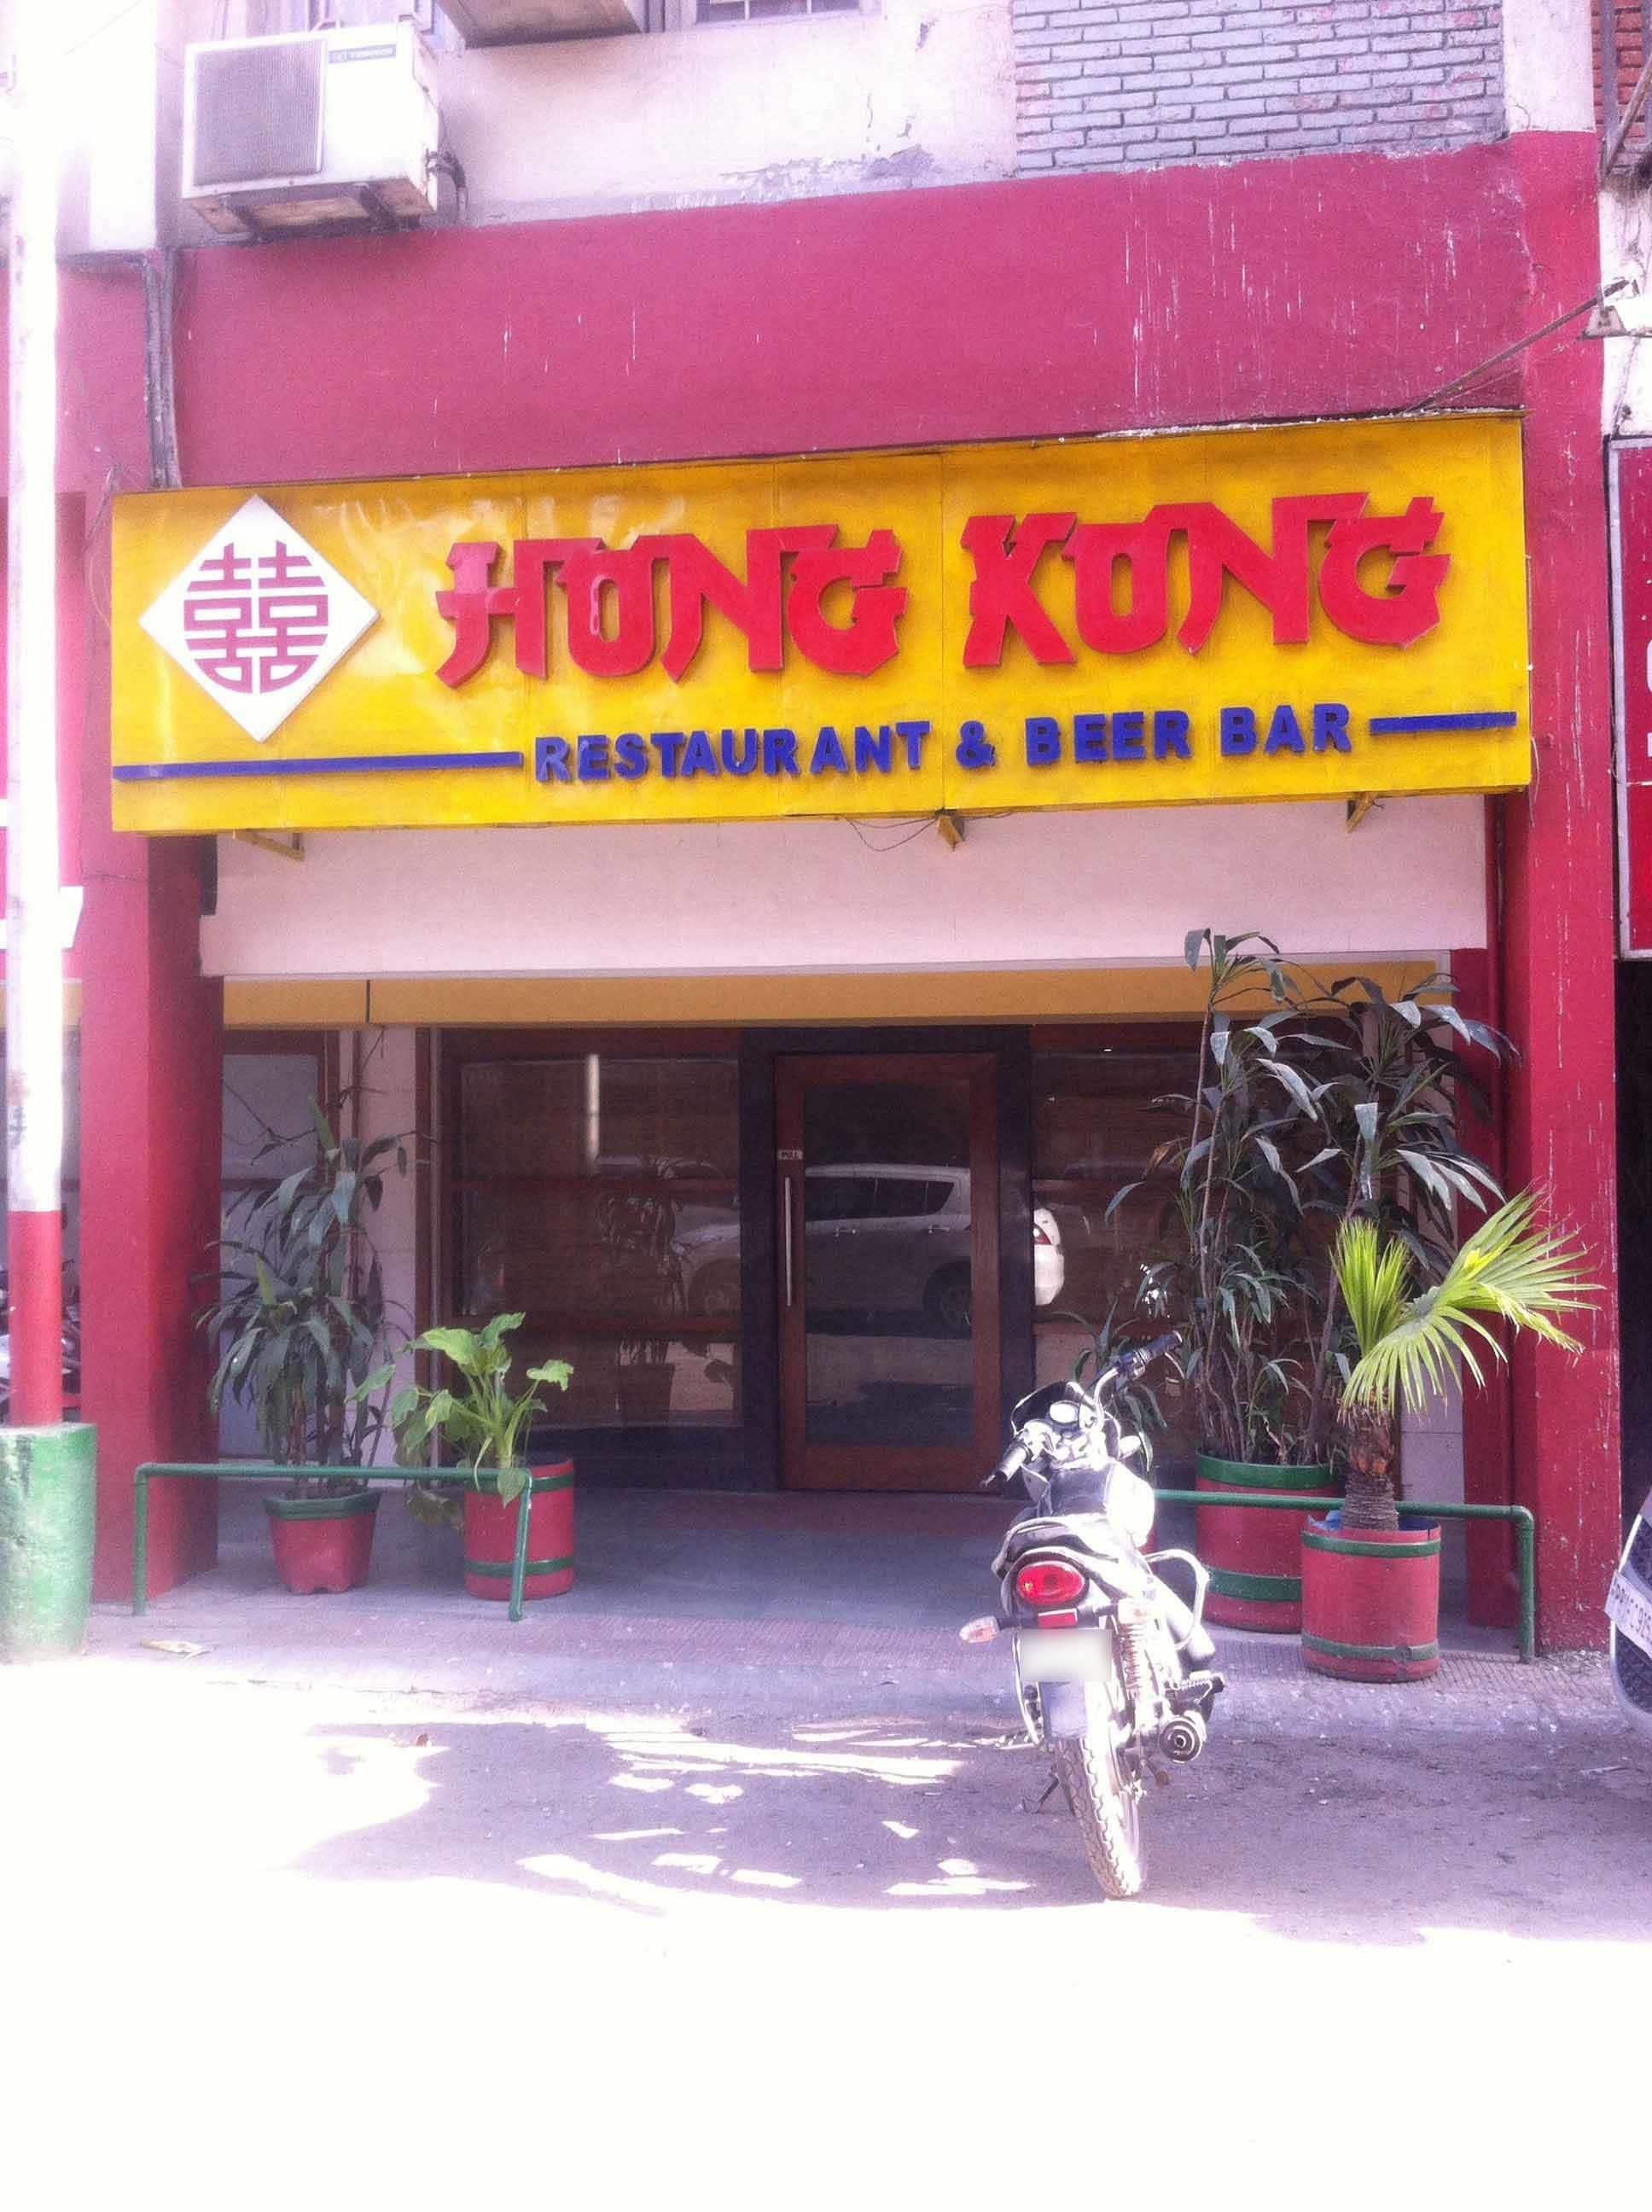 Hong Kong Restaurant - ludhiana Junction - Ludhiana Image